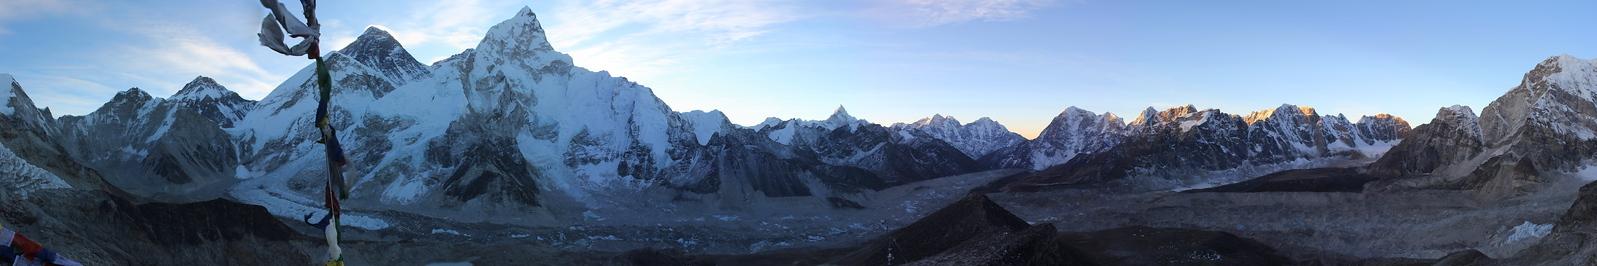 Kala Pattar View Panorama